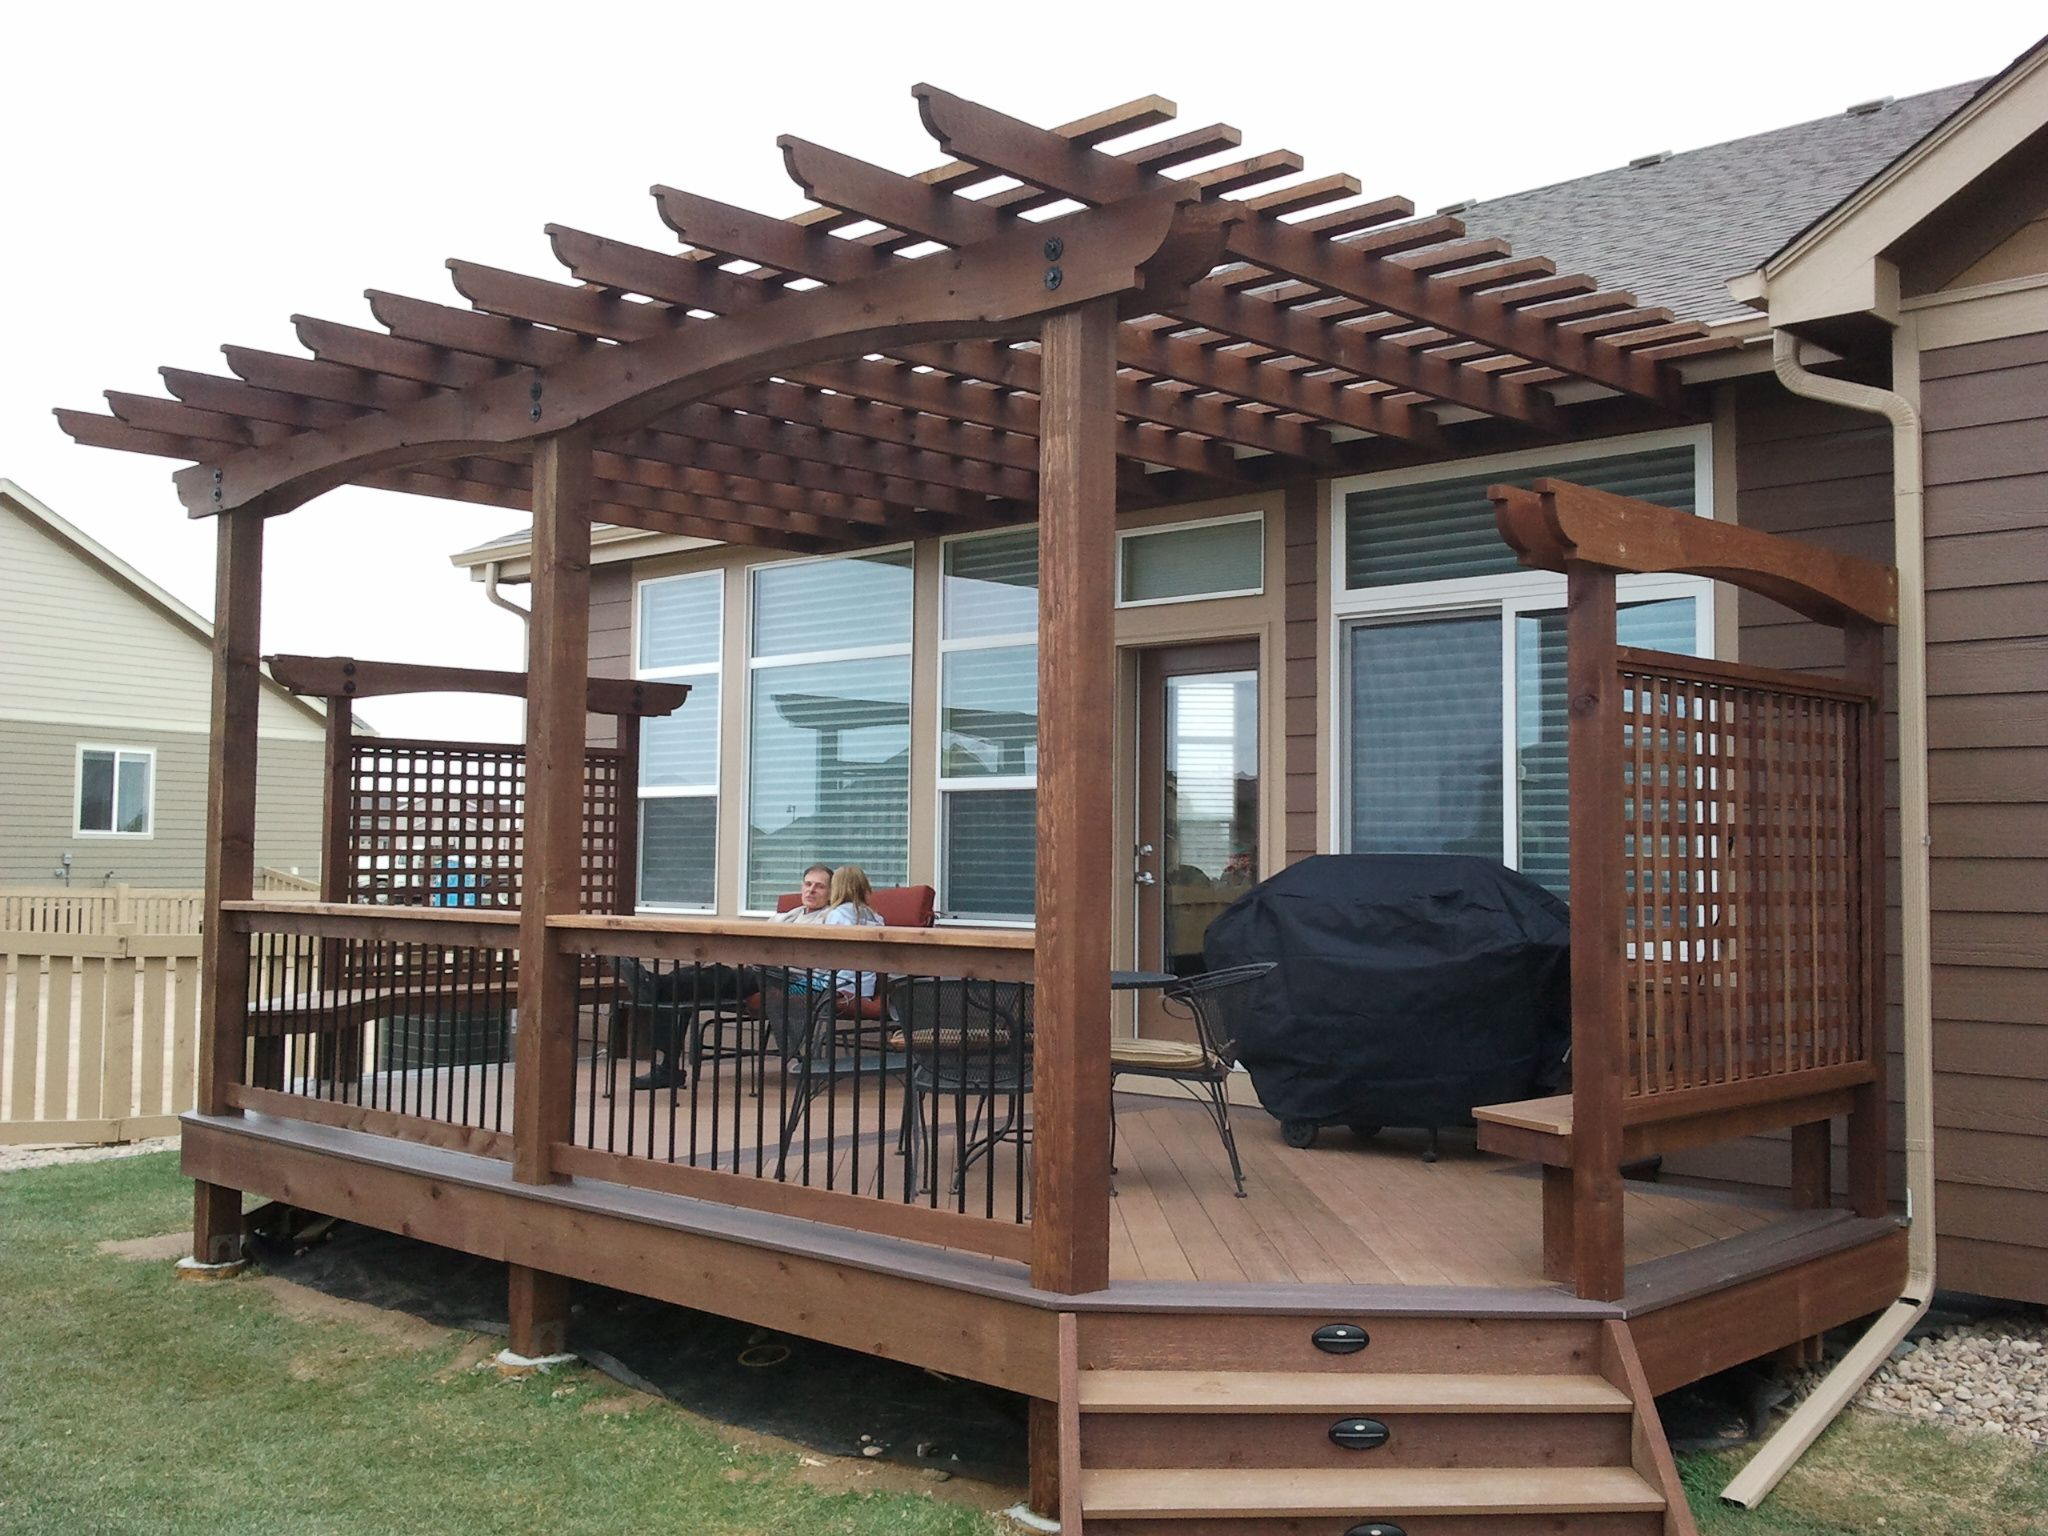 Concrete Patio Covering Ideas | Patio Cover Ideas: For Decks And Patios